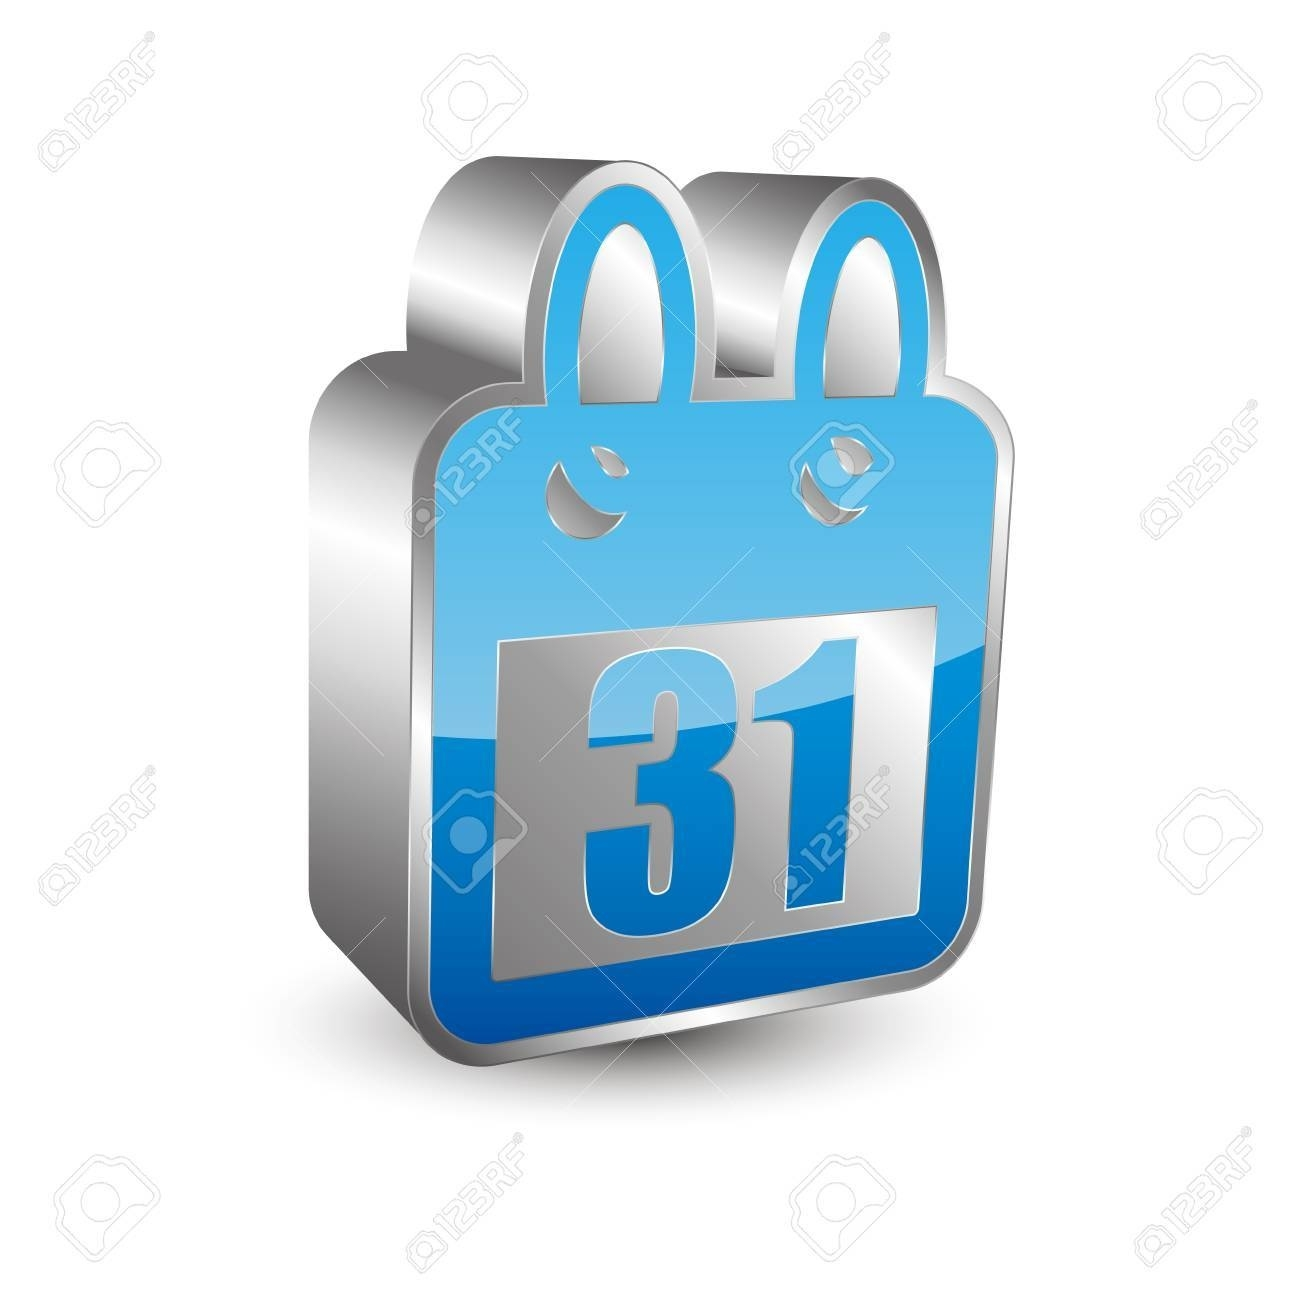 3D Calendar Icon Royalty Free Cliparts, Vectors, And Stock 3D Calendar Icon Vector